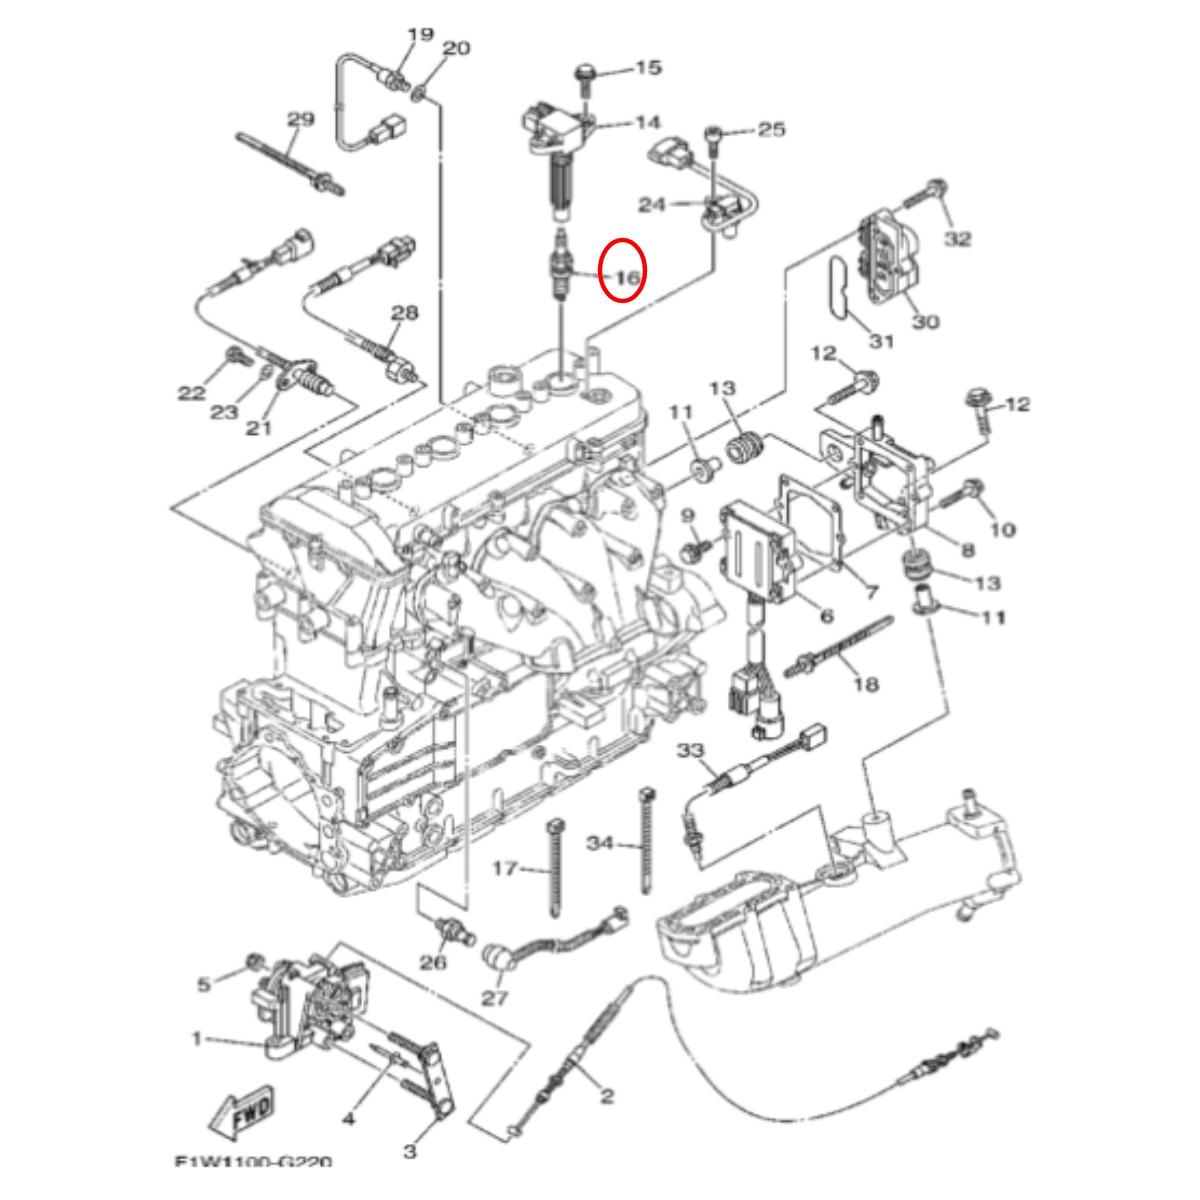 Vela LFR6A-11 para Jet Ski Yamaha SHO/VXR/FZR/FZS 1.8 NGK (Unitária)  - Radical Peças - Peças para Jet Ski